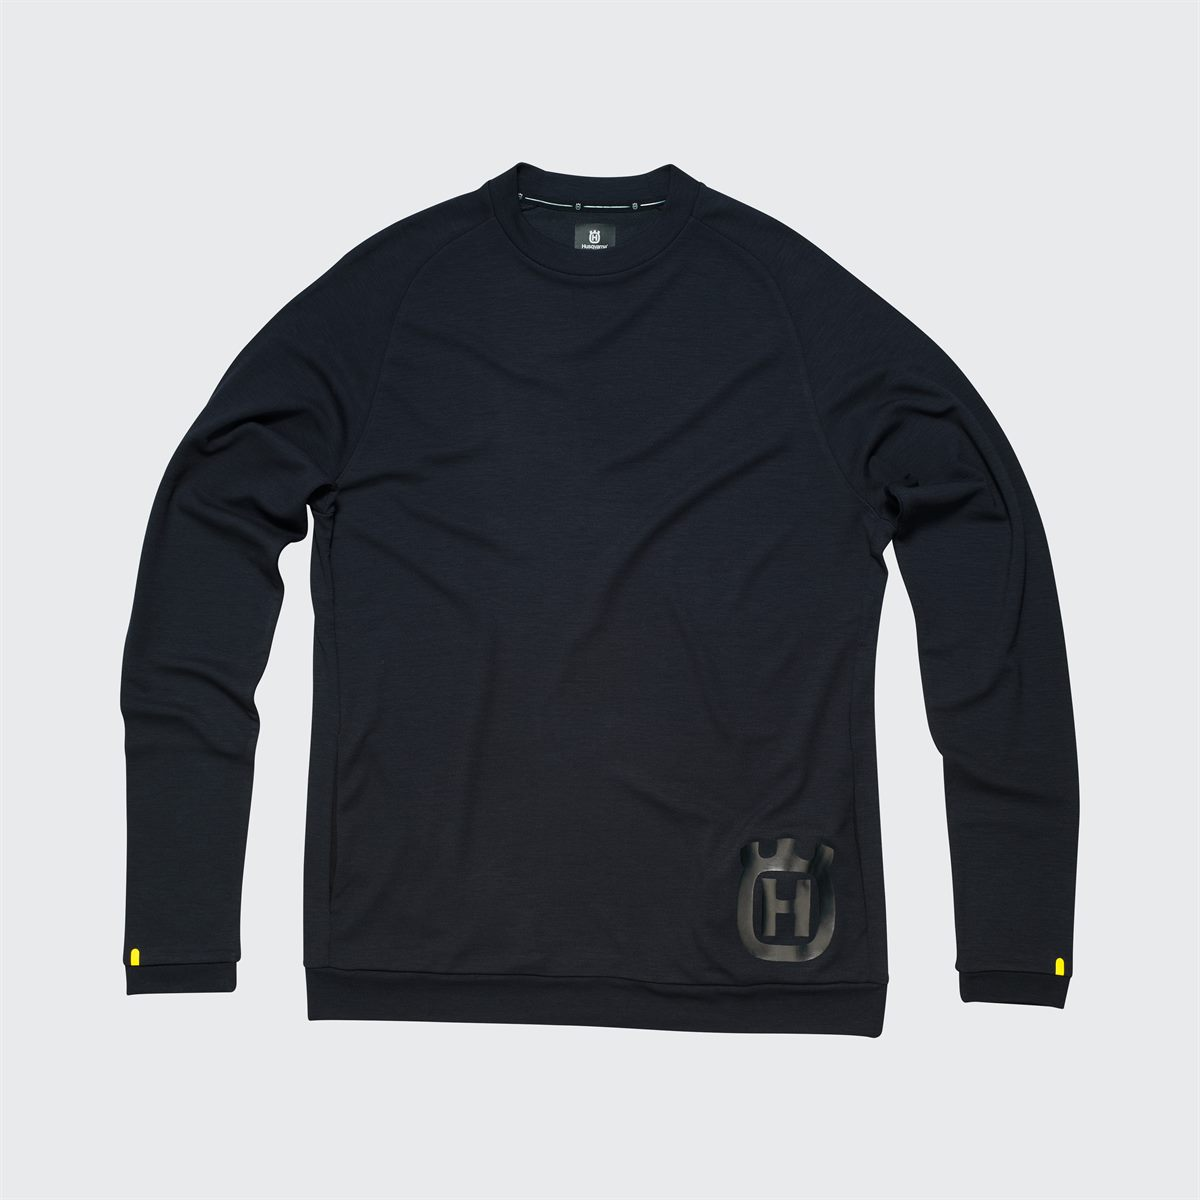 Husqvarna Motorcycles Present 2019 VITPILEN & SVARTPILEN Clothing Collection - PROGRESS SWEATER